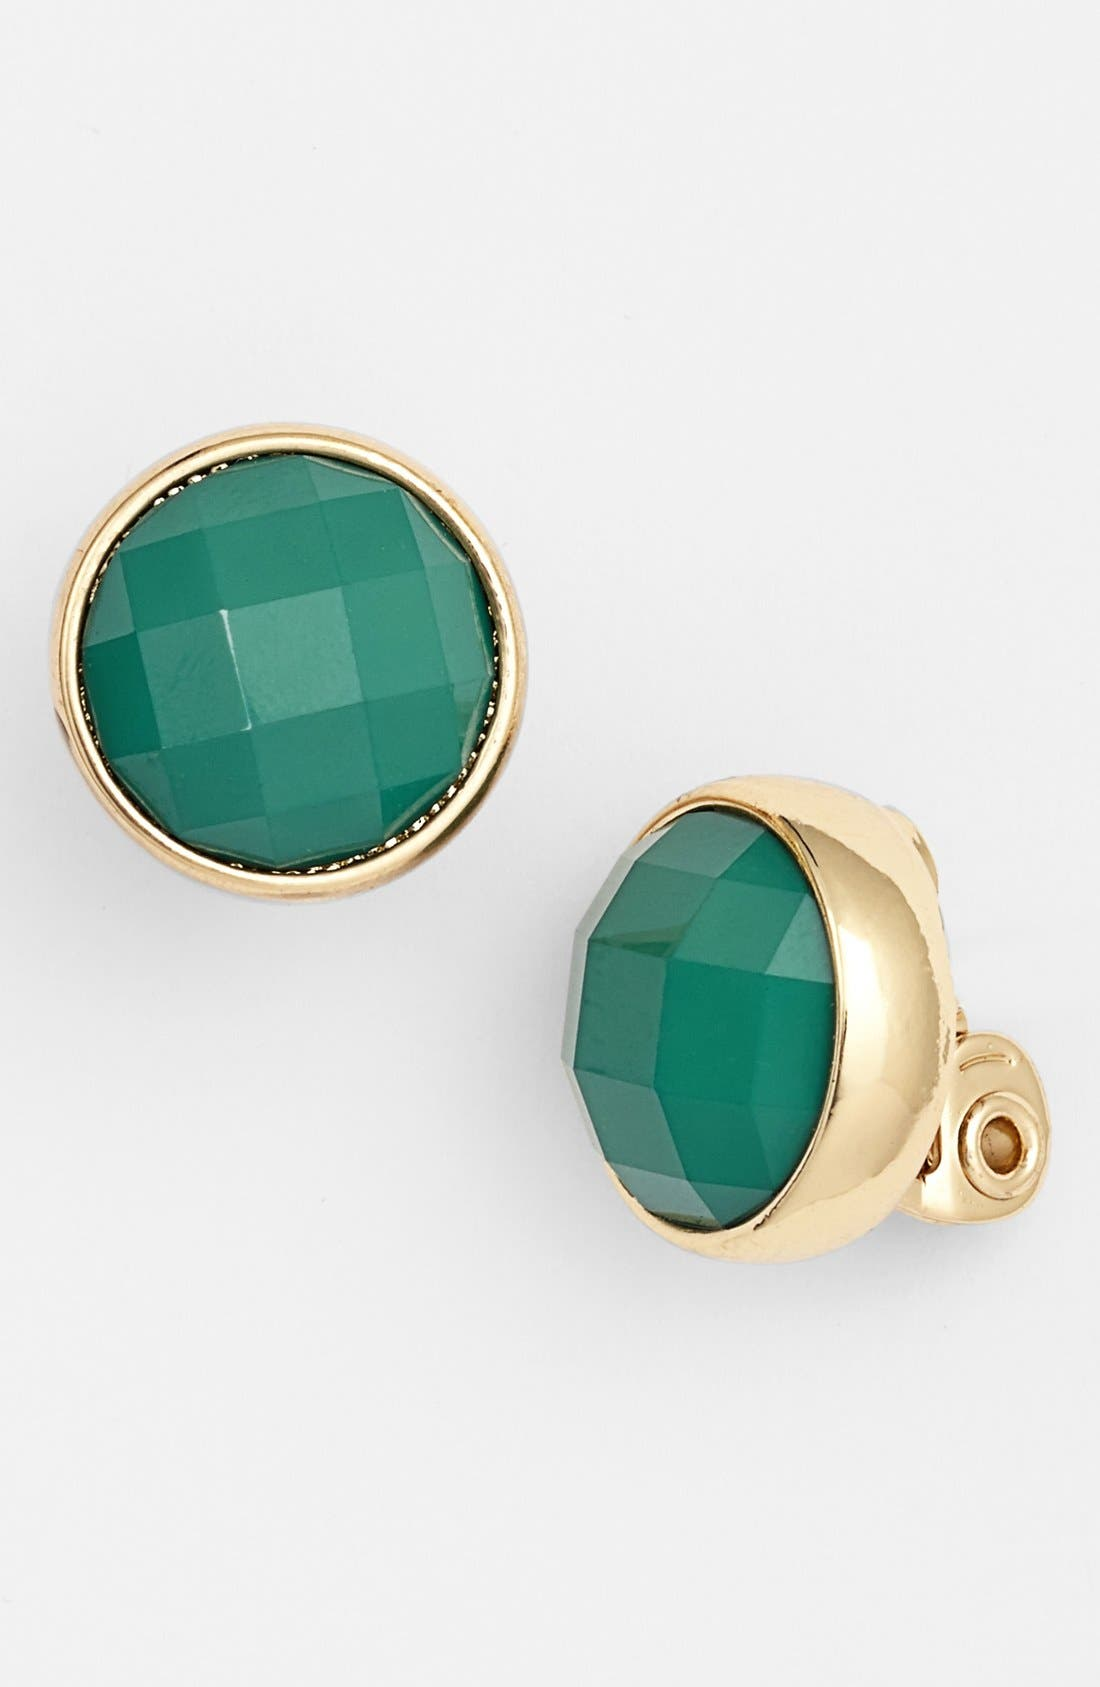 Main Image - Anne Klein Stone Clip Earrings